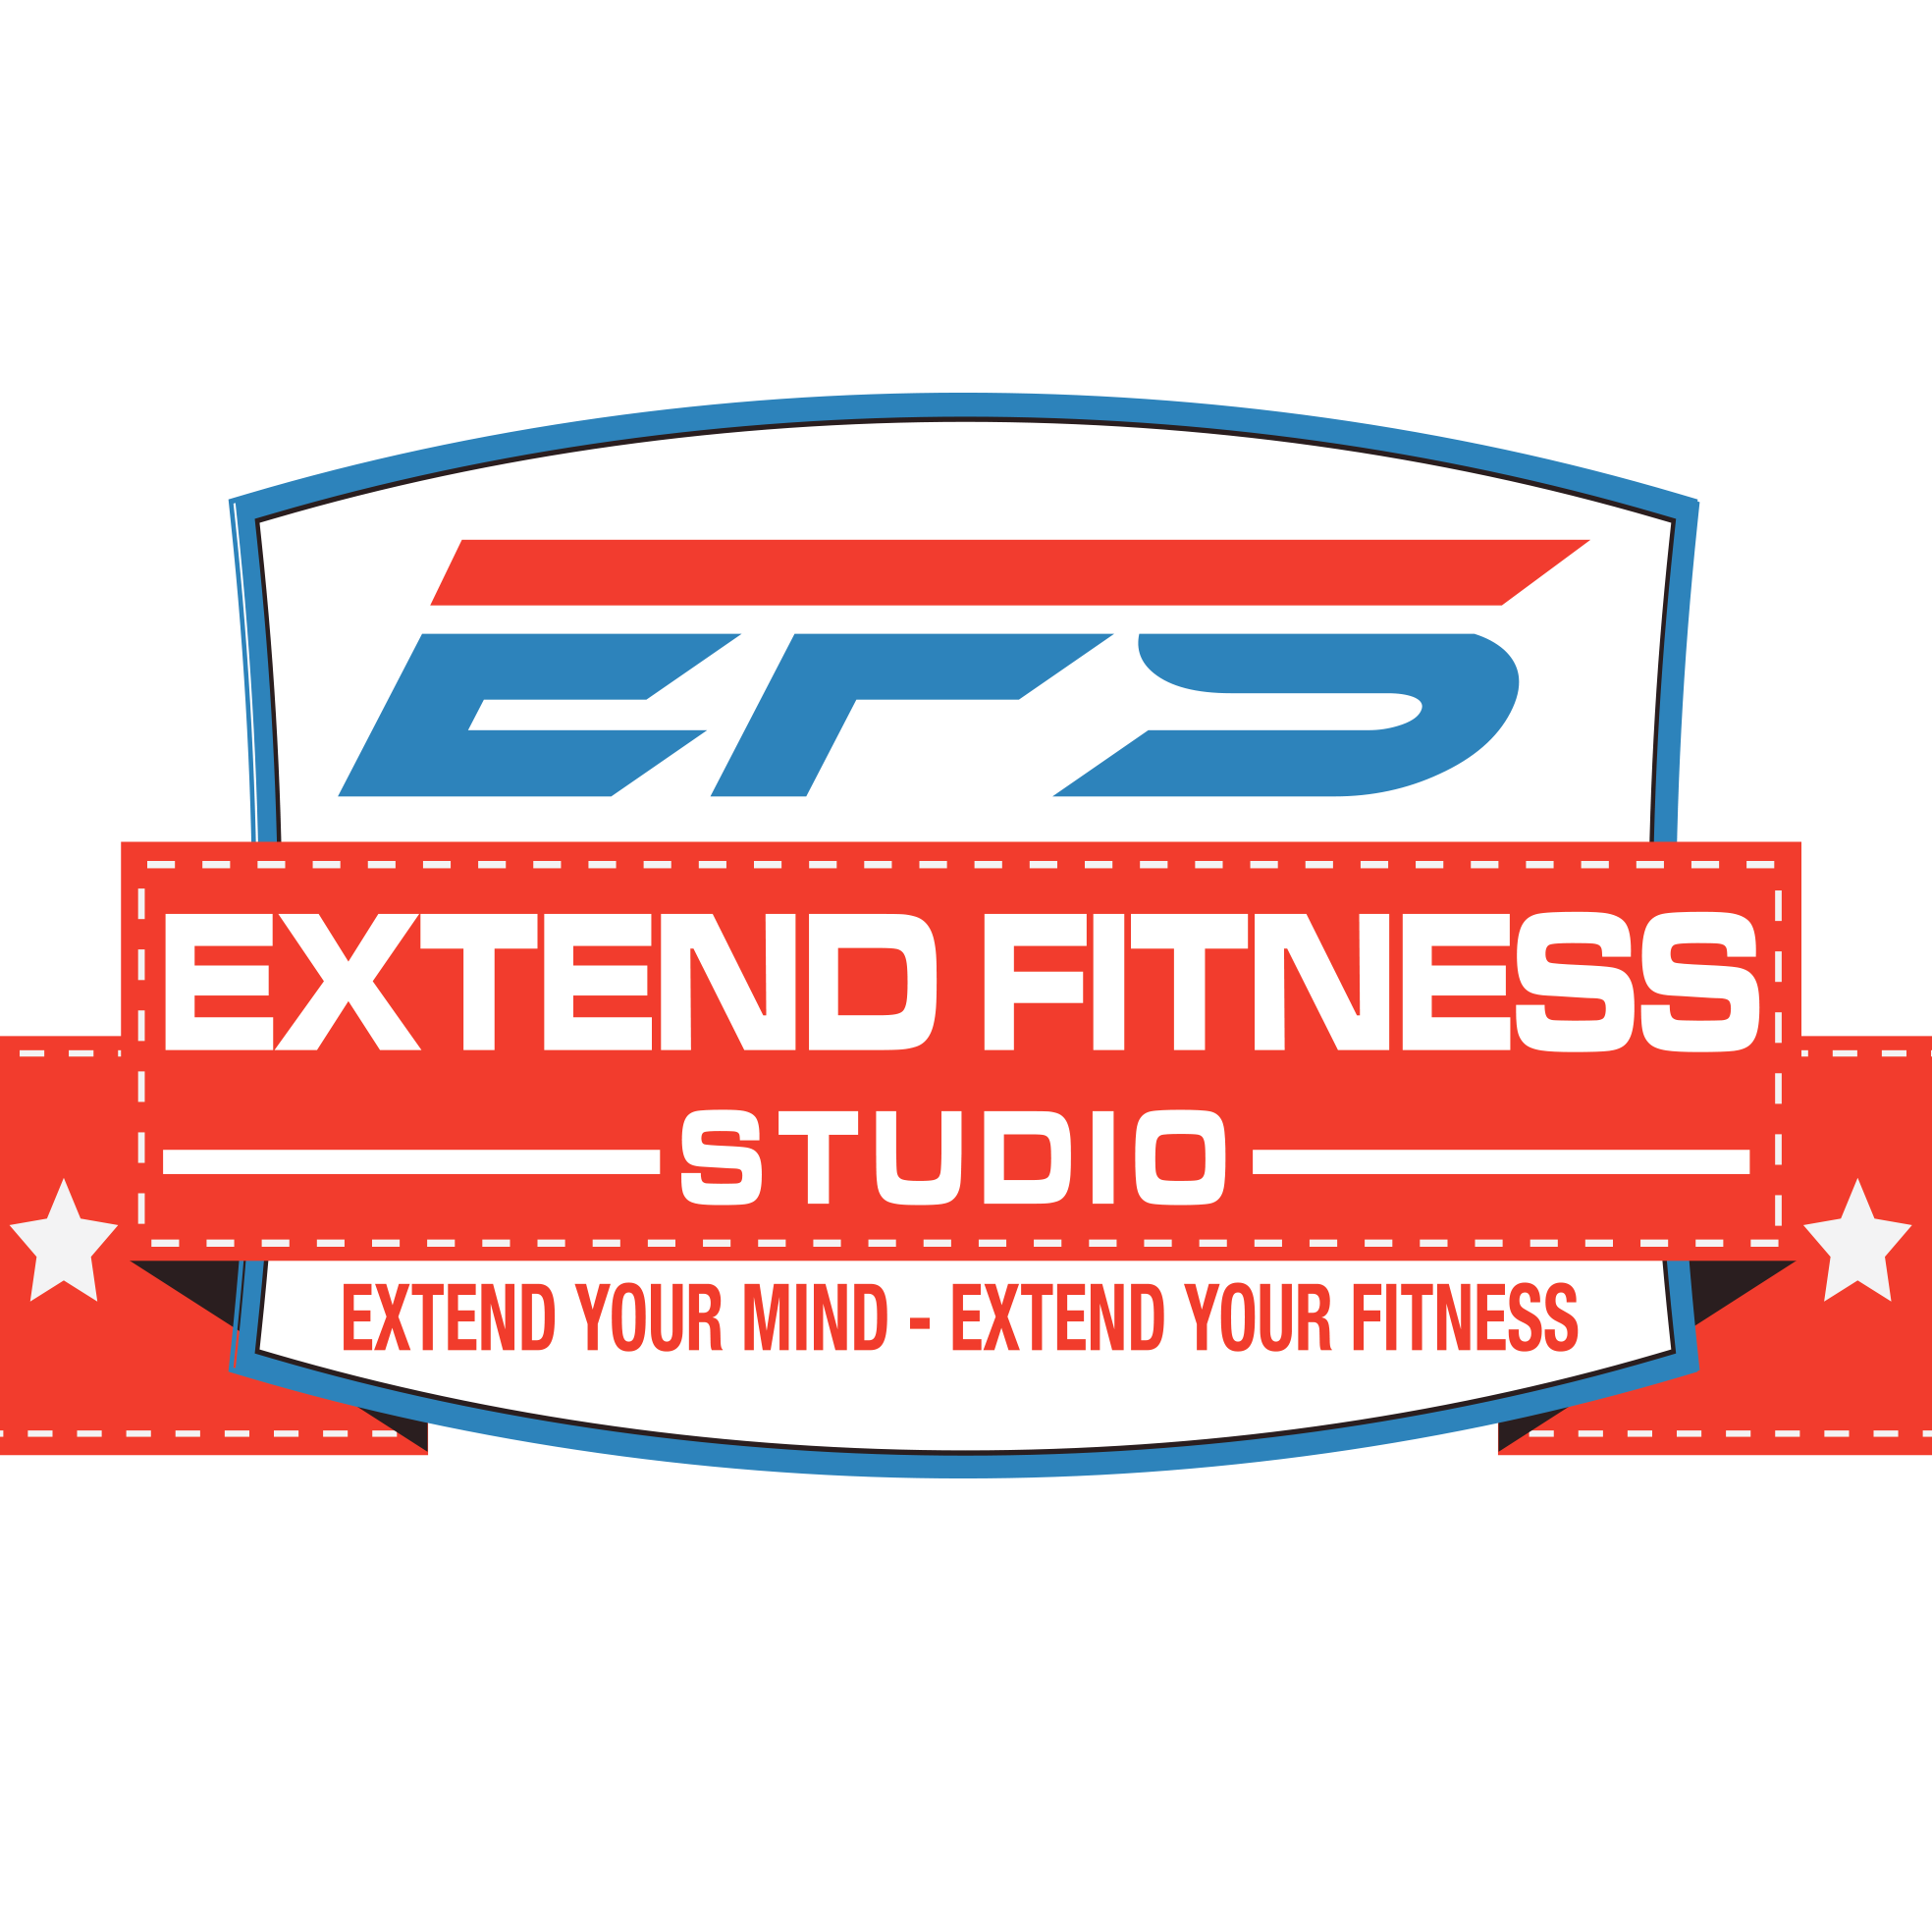 Extend Fitness Studio